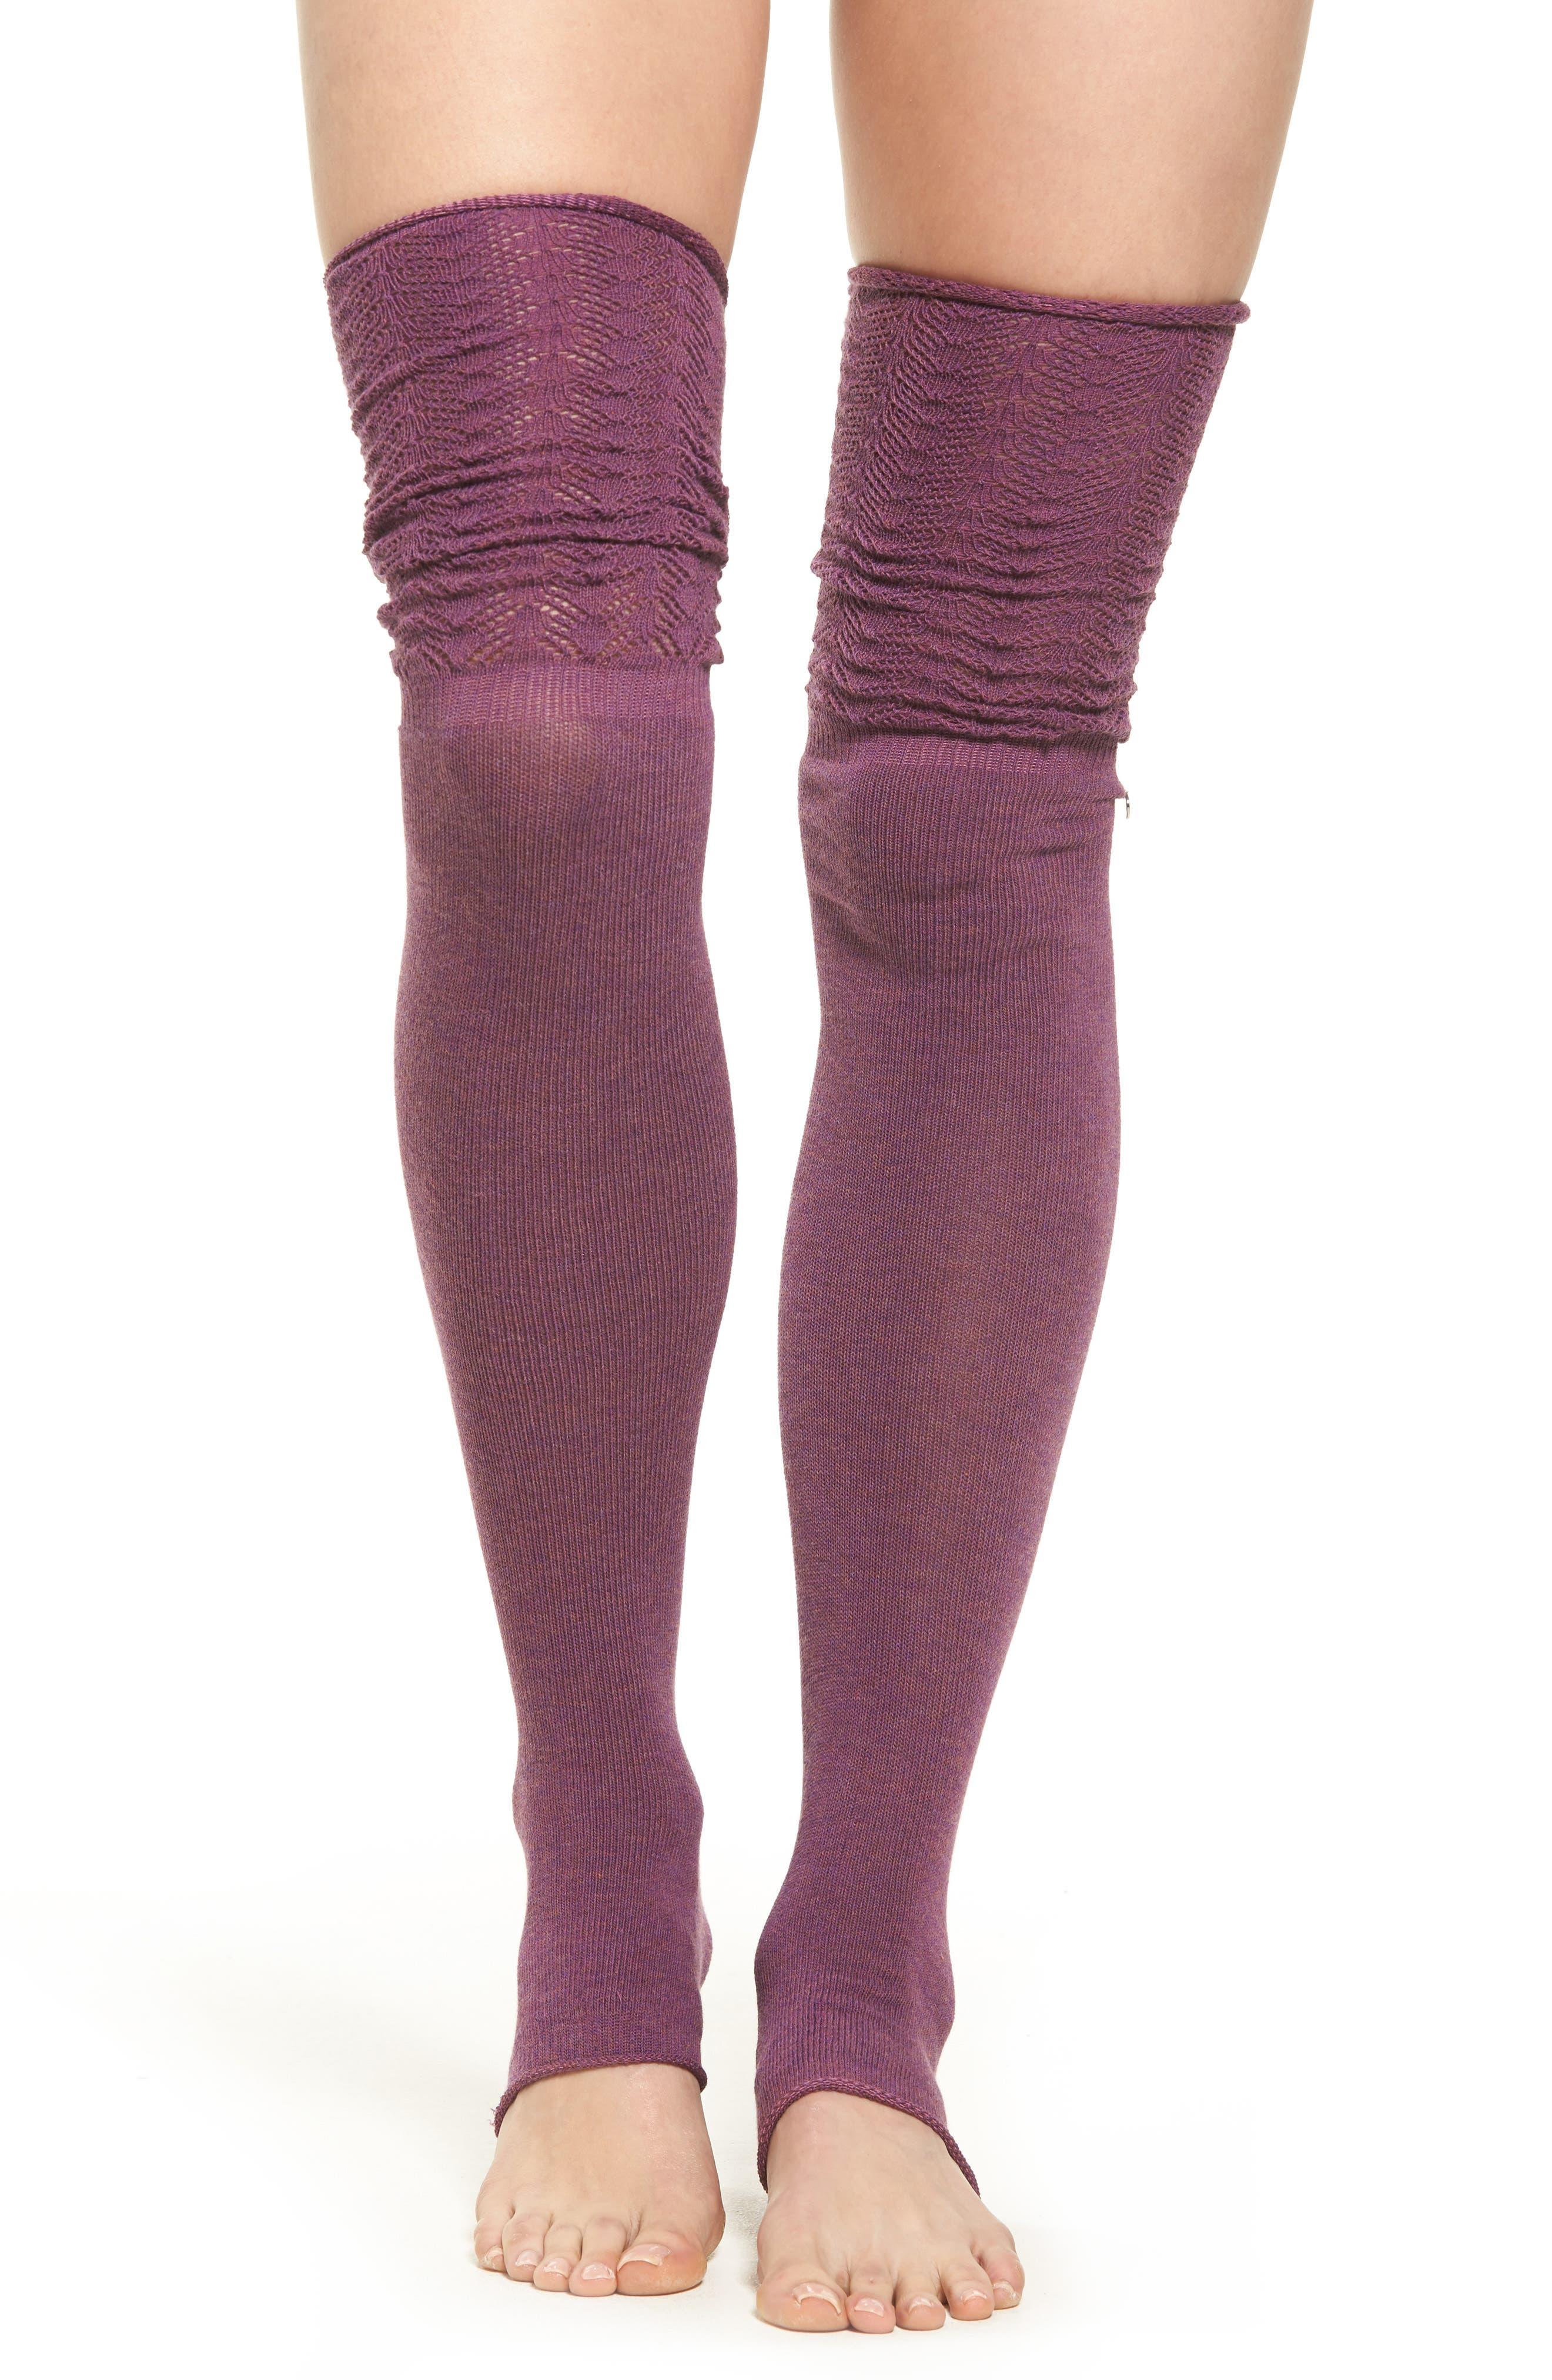 Main Image - ToeSox Sasha Leg Warmers